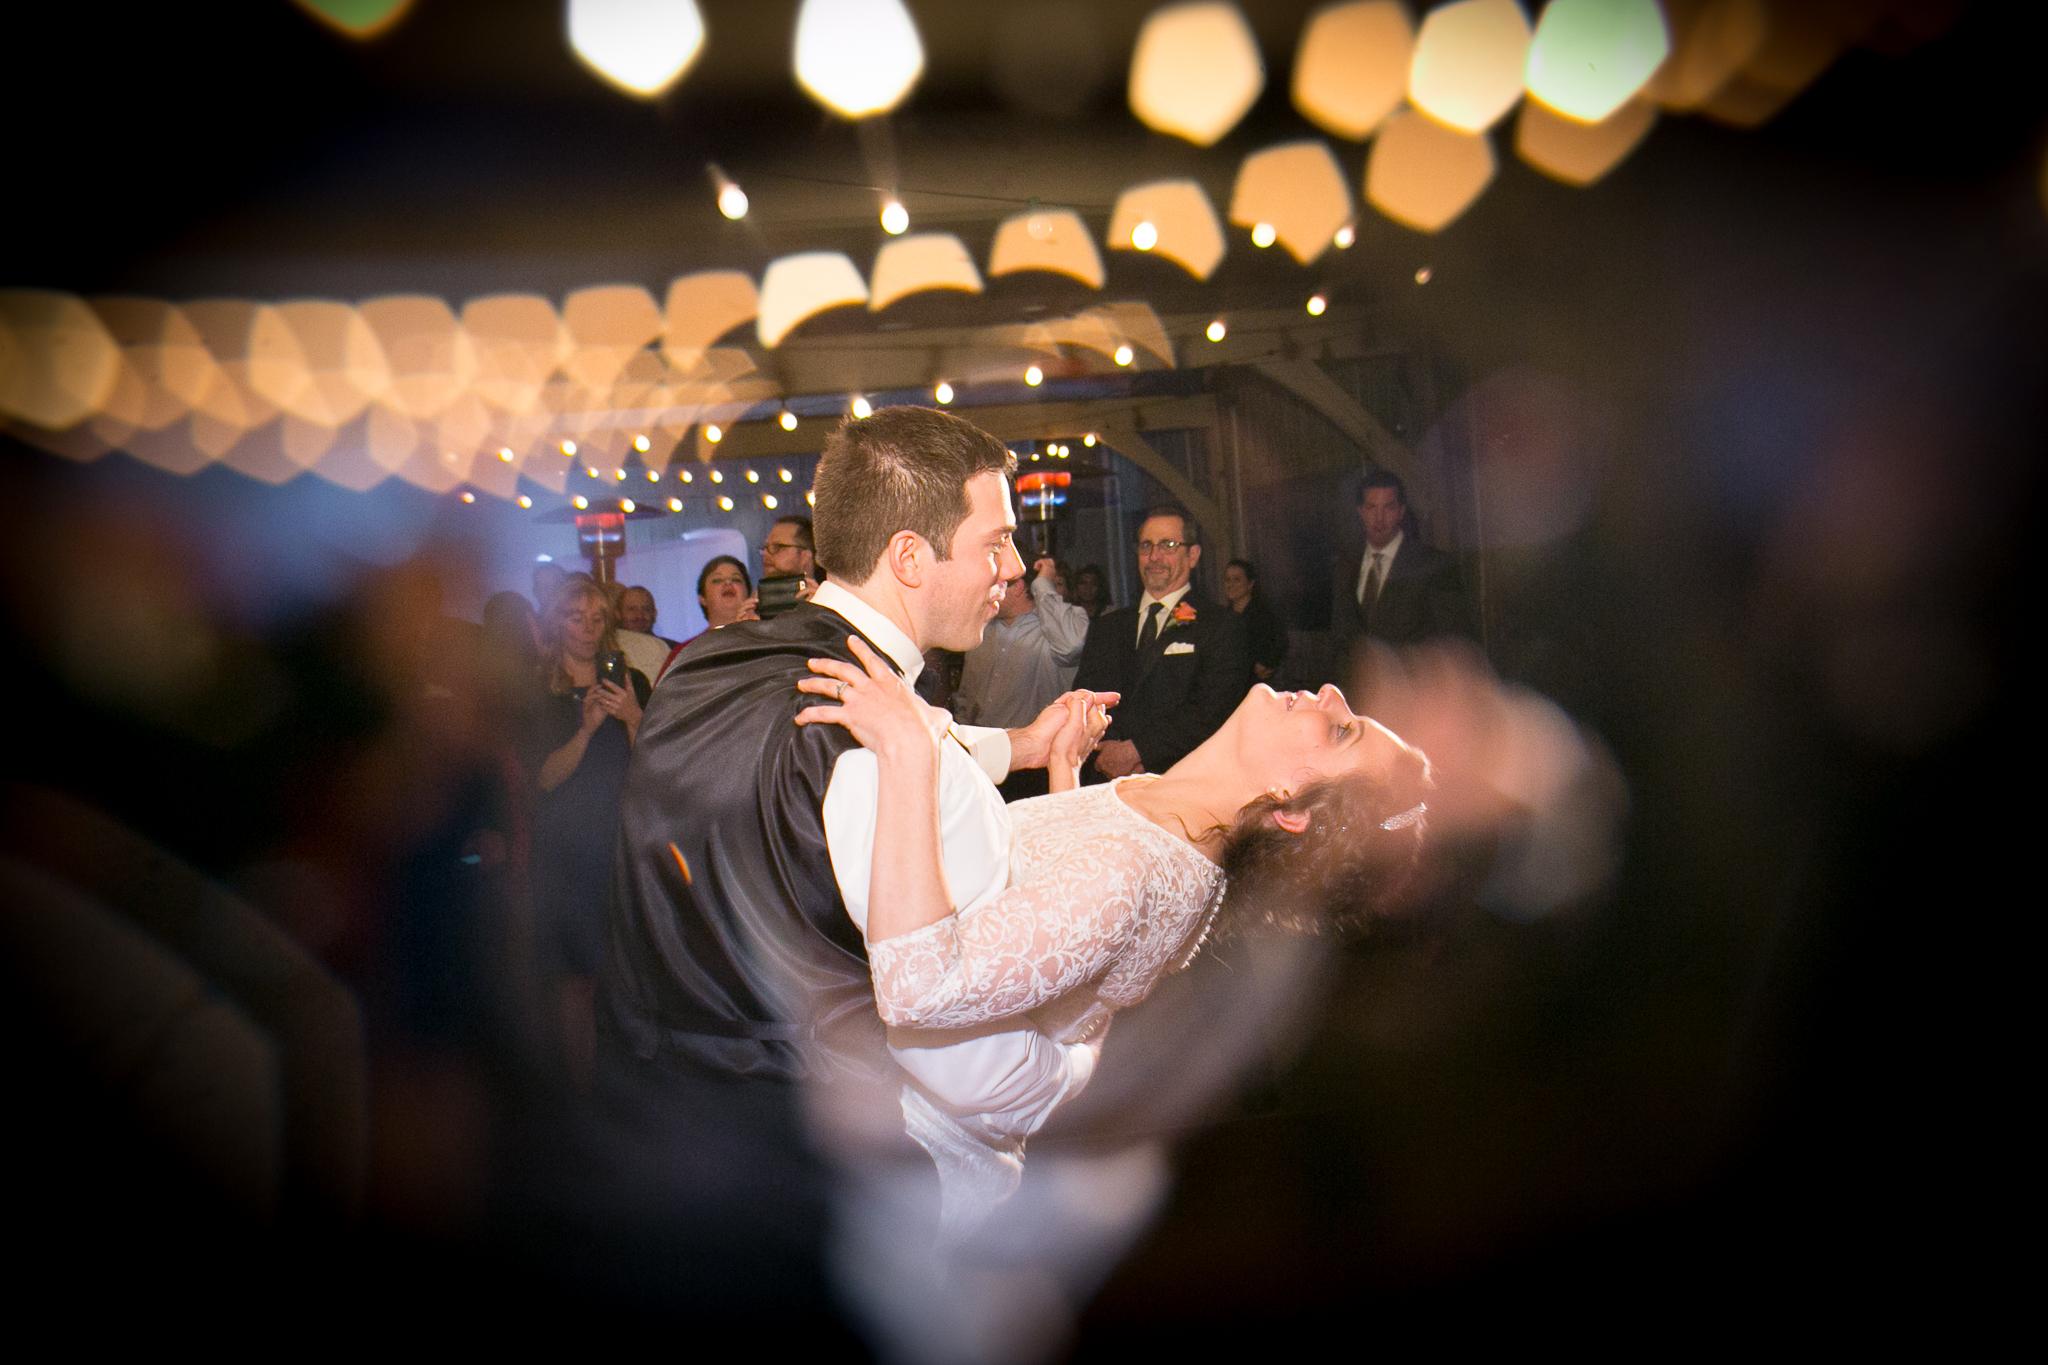 camuglia-whomstudio-chelsea_and_andy-nycphotographer-wedding-brooklyn-buffalo-timberlodge-110-5590.jpg